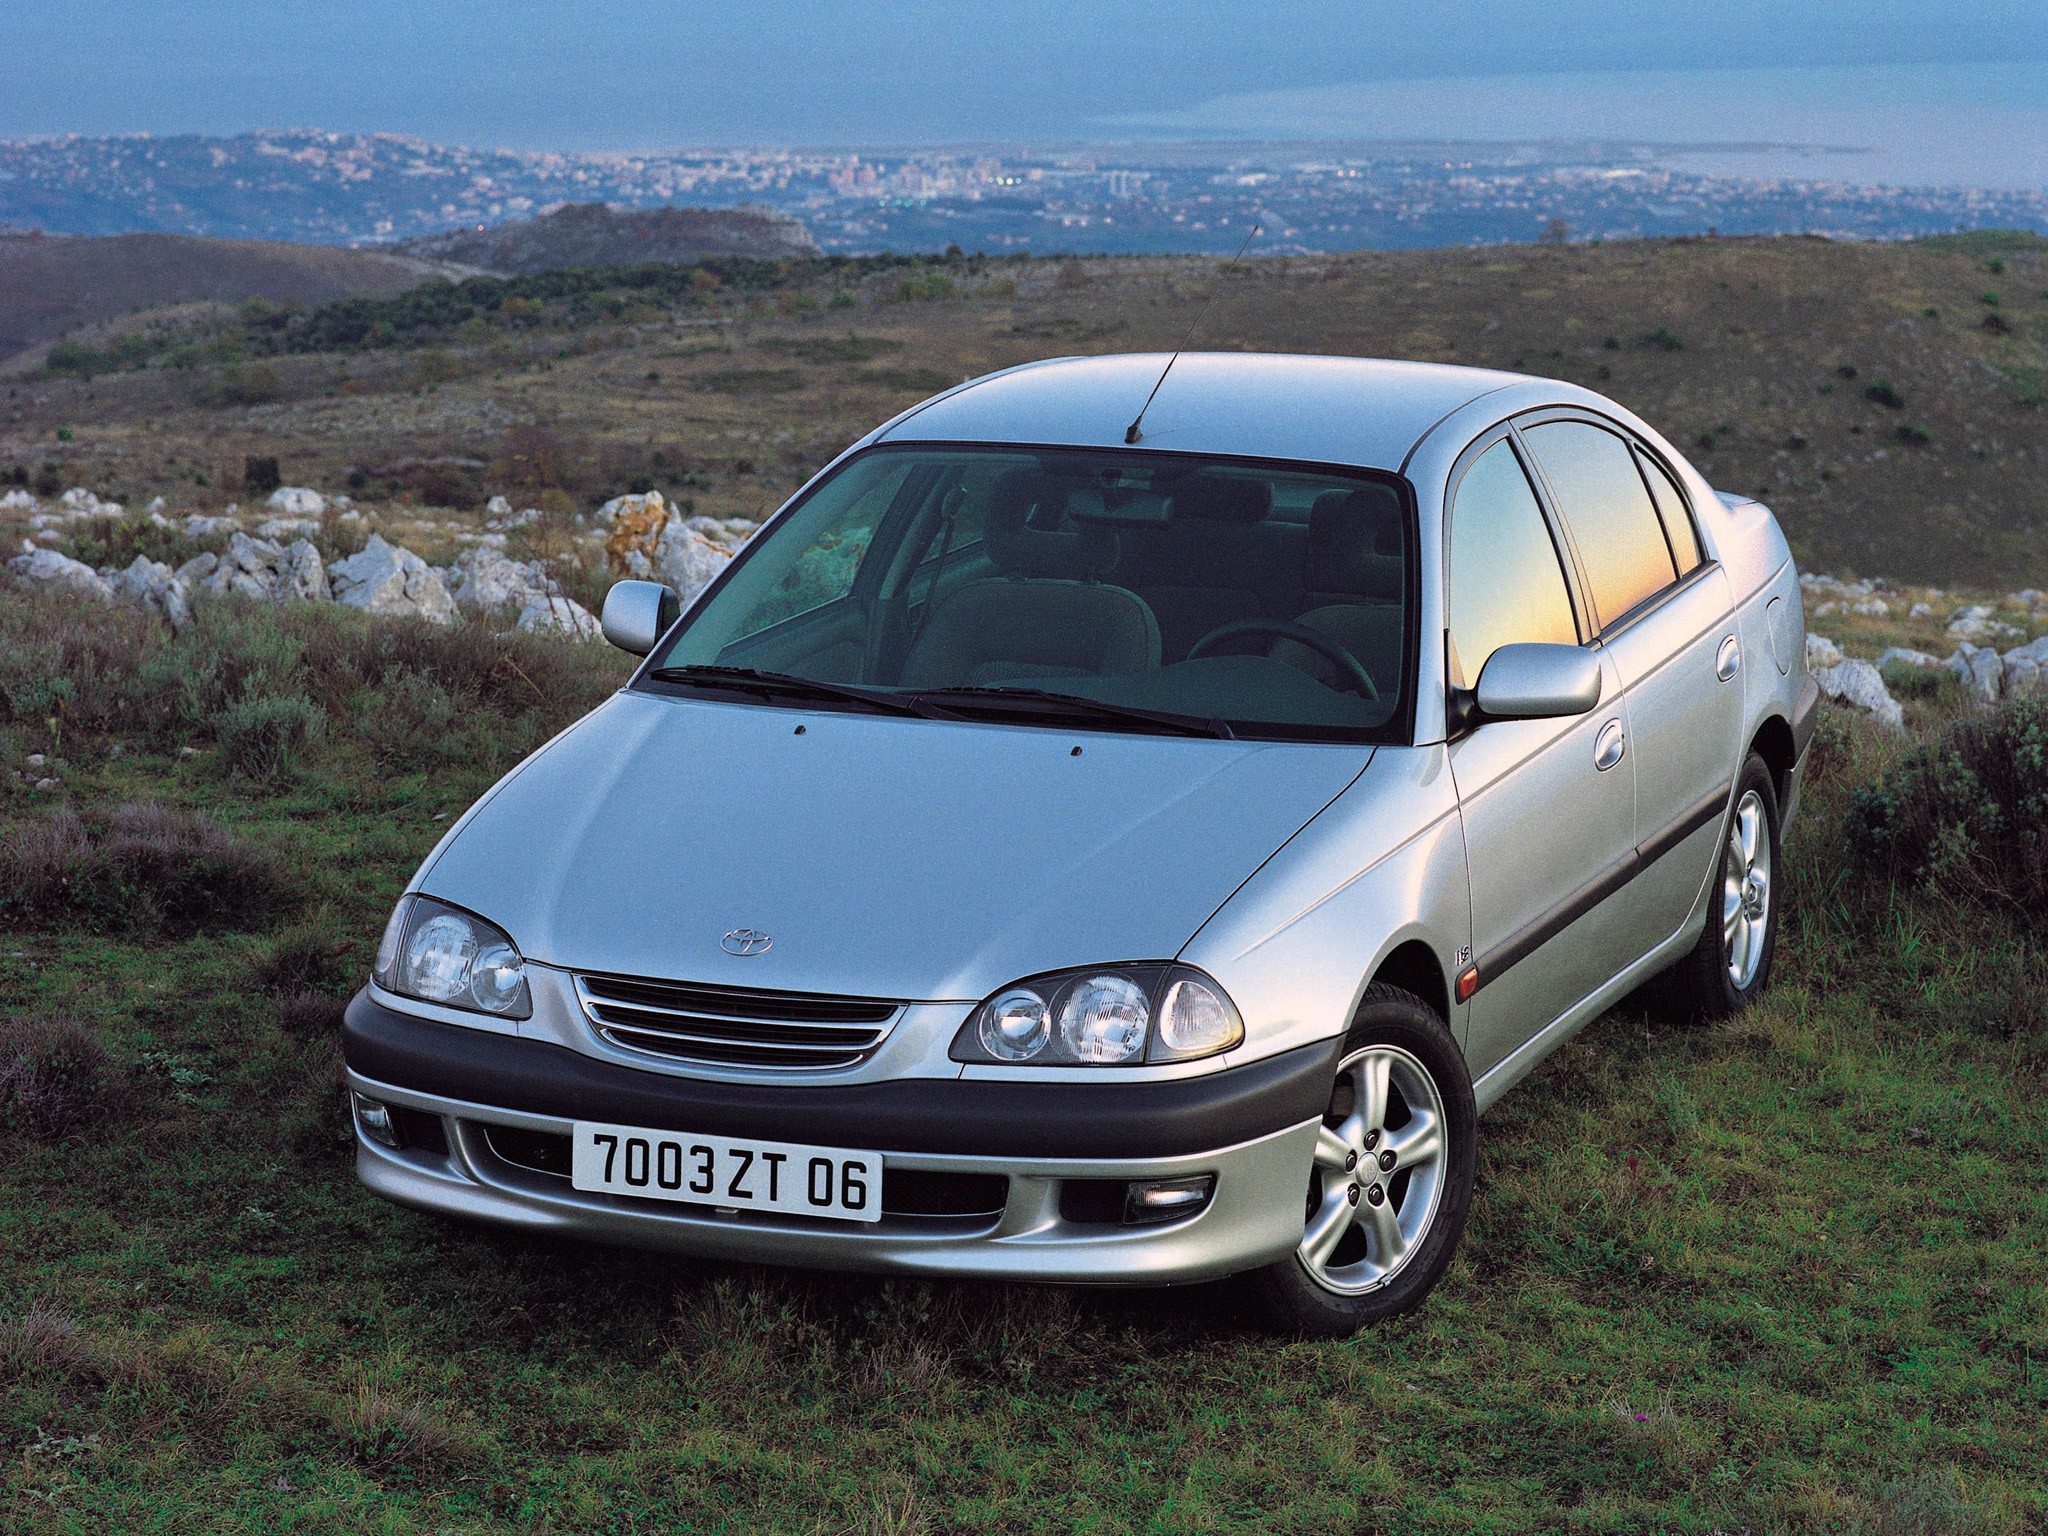 Toyota Avensis Specs 1997 1998 1999 2000 Autoevolution